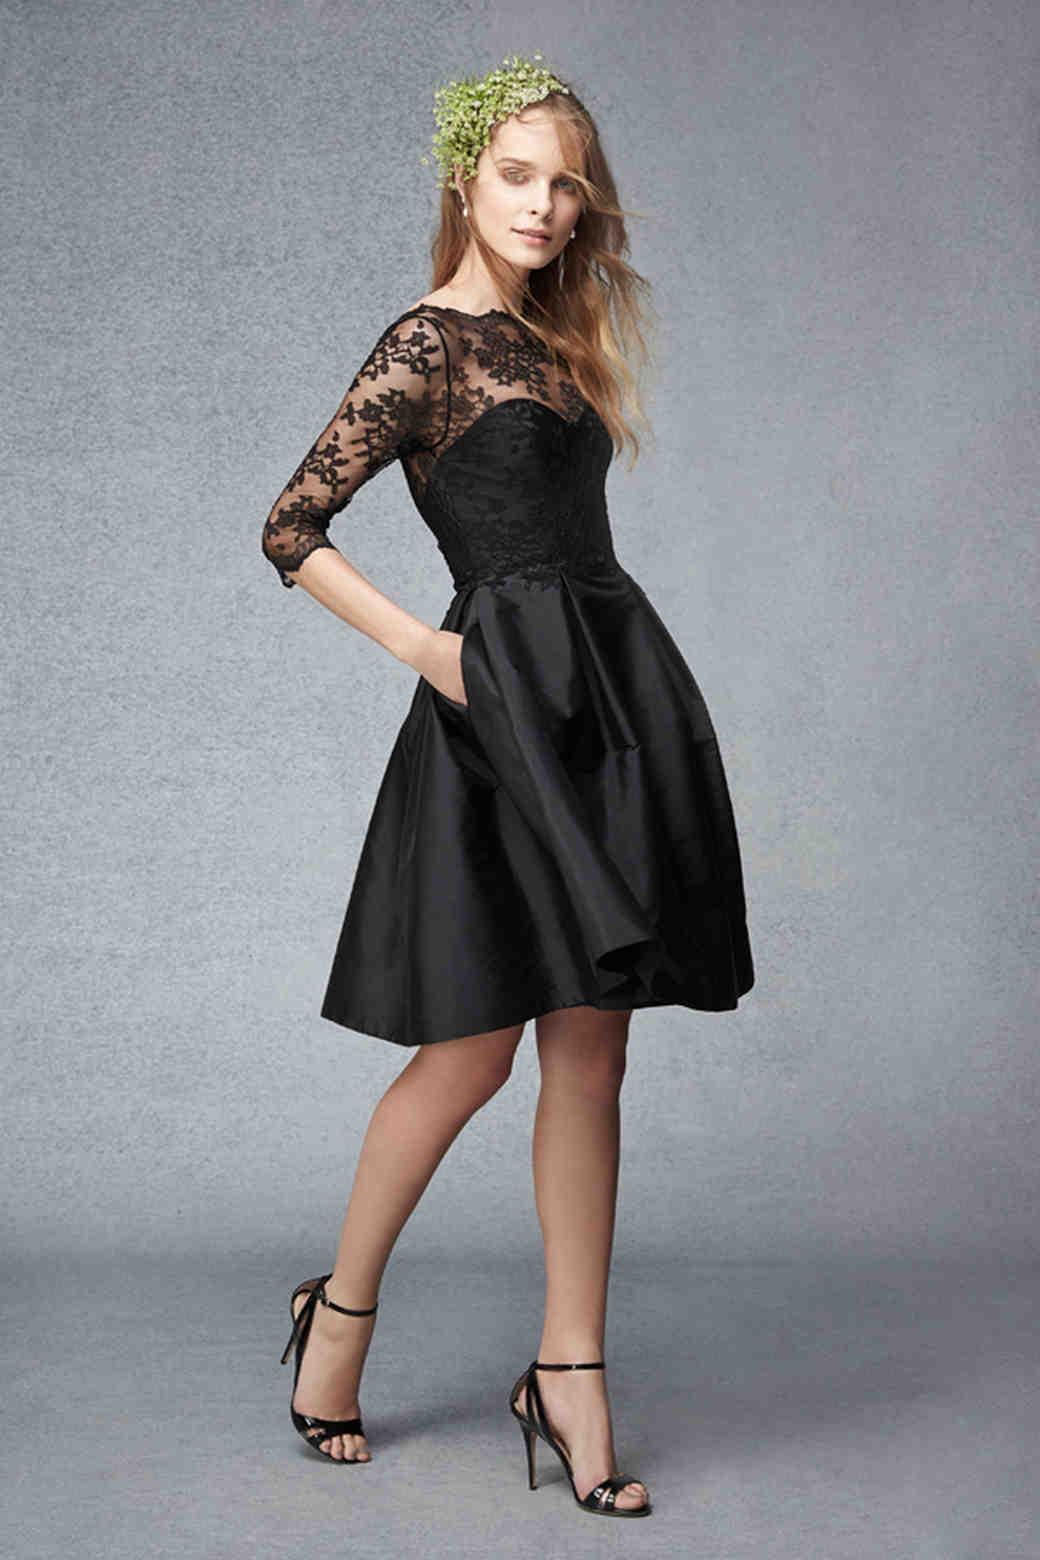 Short Black Bridal Dresses,Black Wedding Short Dresses,Short Black Dresses for Weddings,Short Black Wedding Dresses,Short Black Wedding Dress,Black Short Wedding Dress,